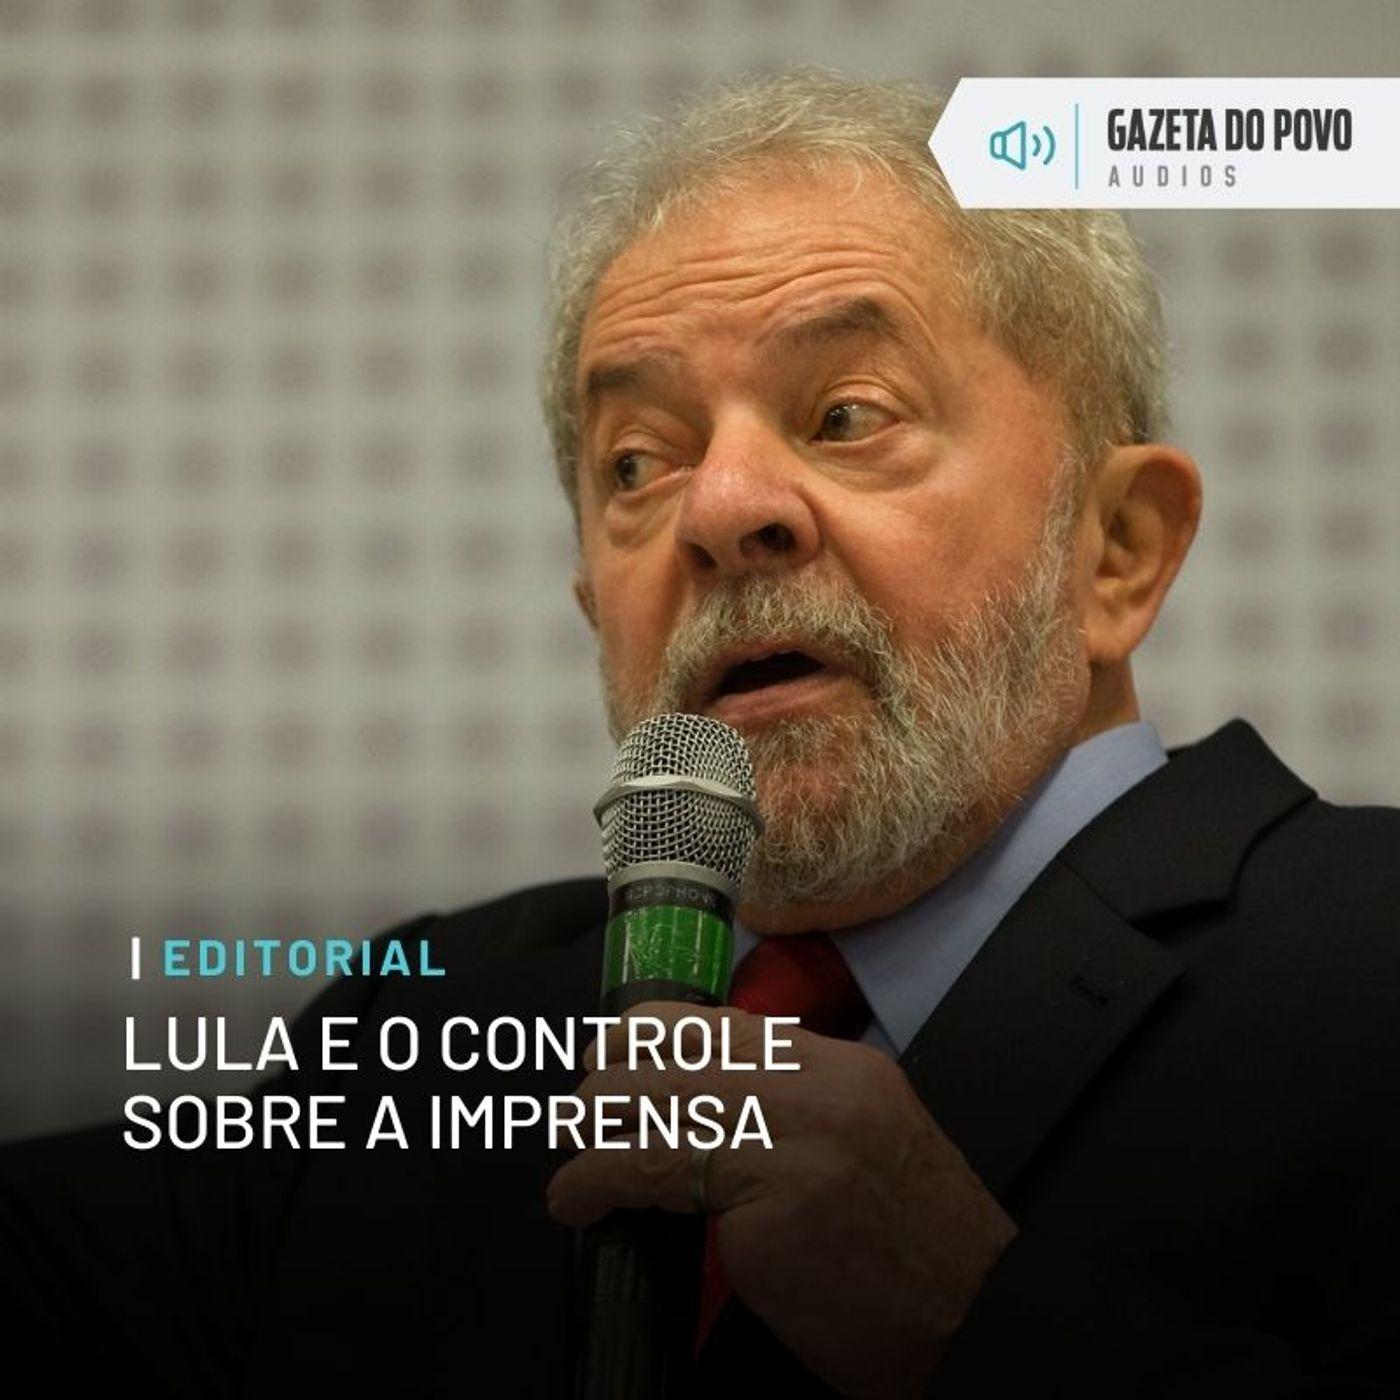 Editorial - Lula e o controle sobre a imprensa